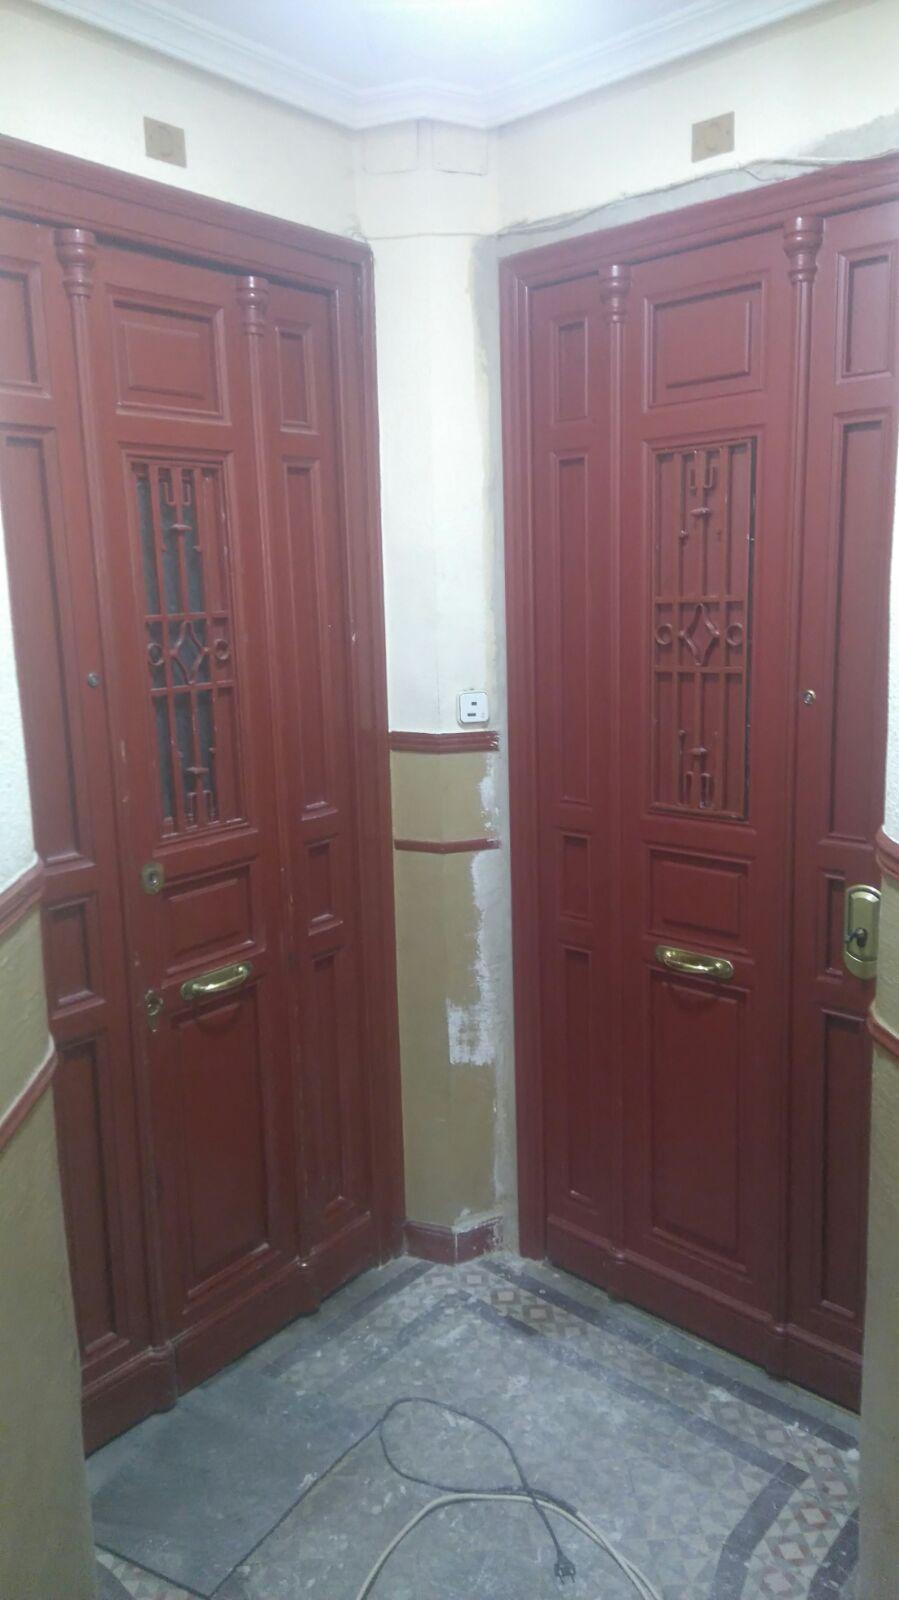 puertas blindadas acorazadas puertas blindadas baratas On puertas blindadas baratas